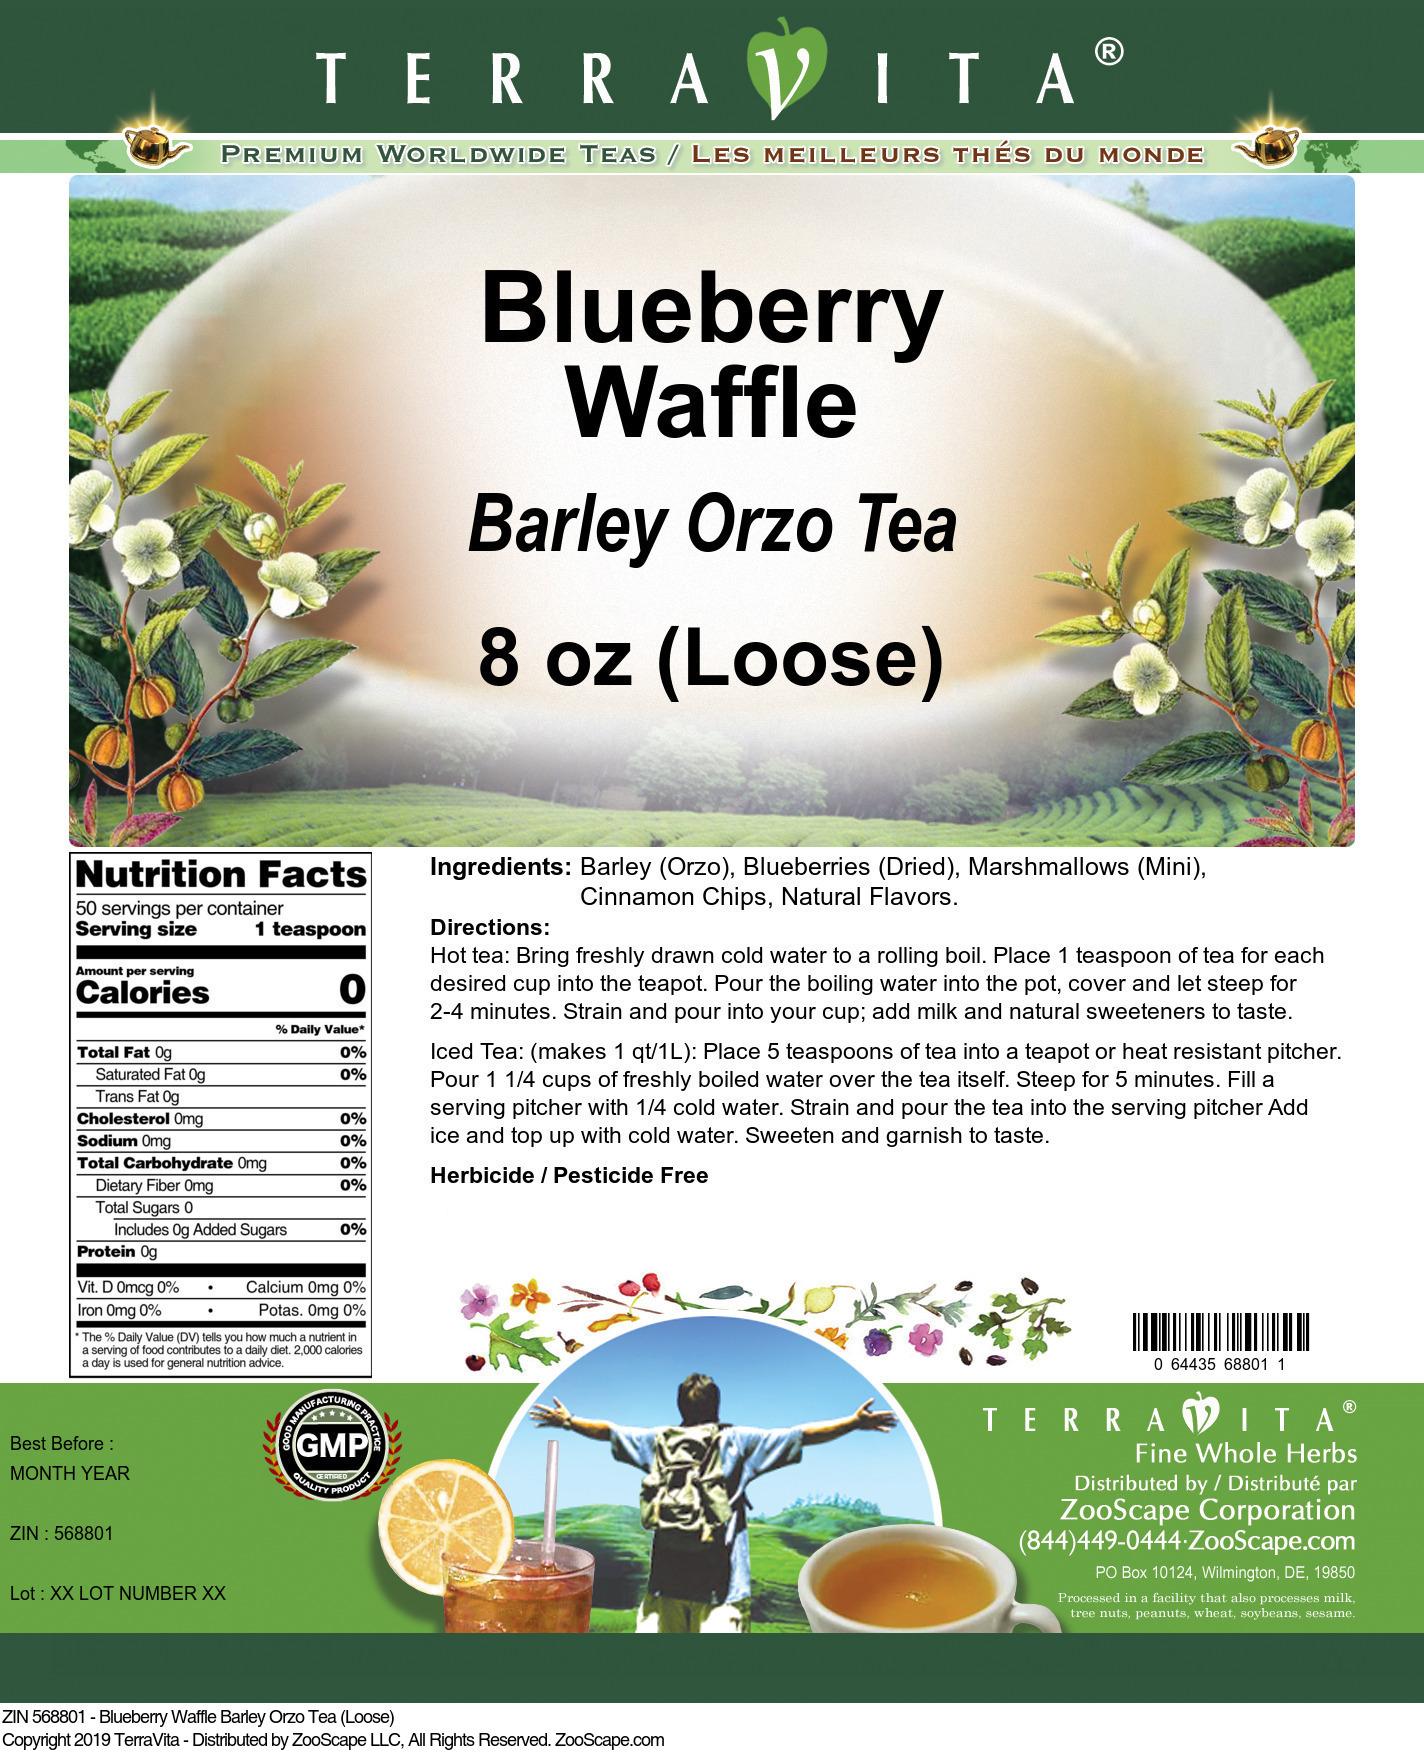 Blueberry Waffle Barley Orzo Tea (Loose)